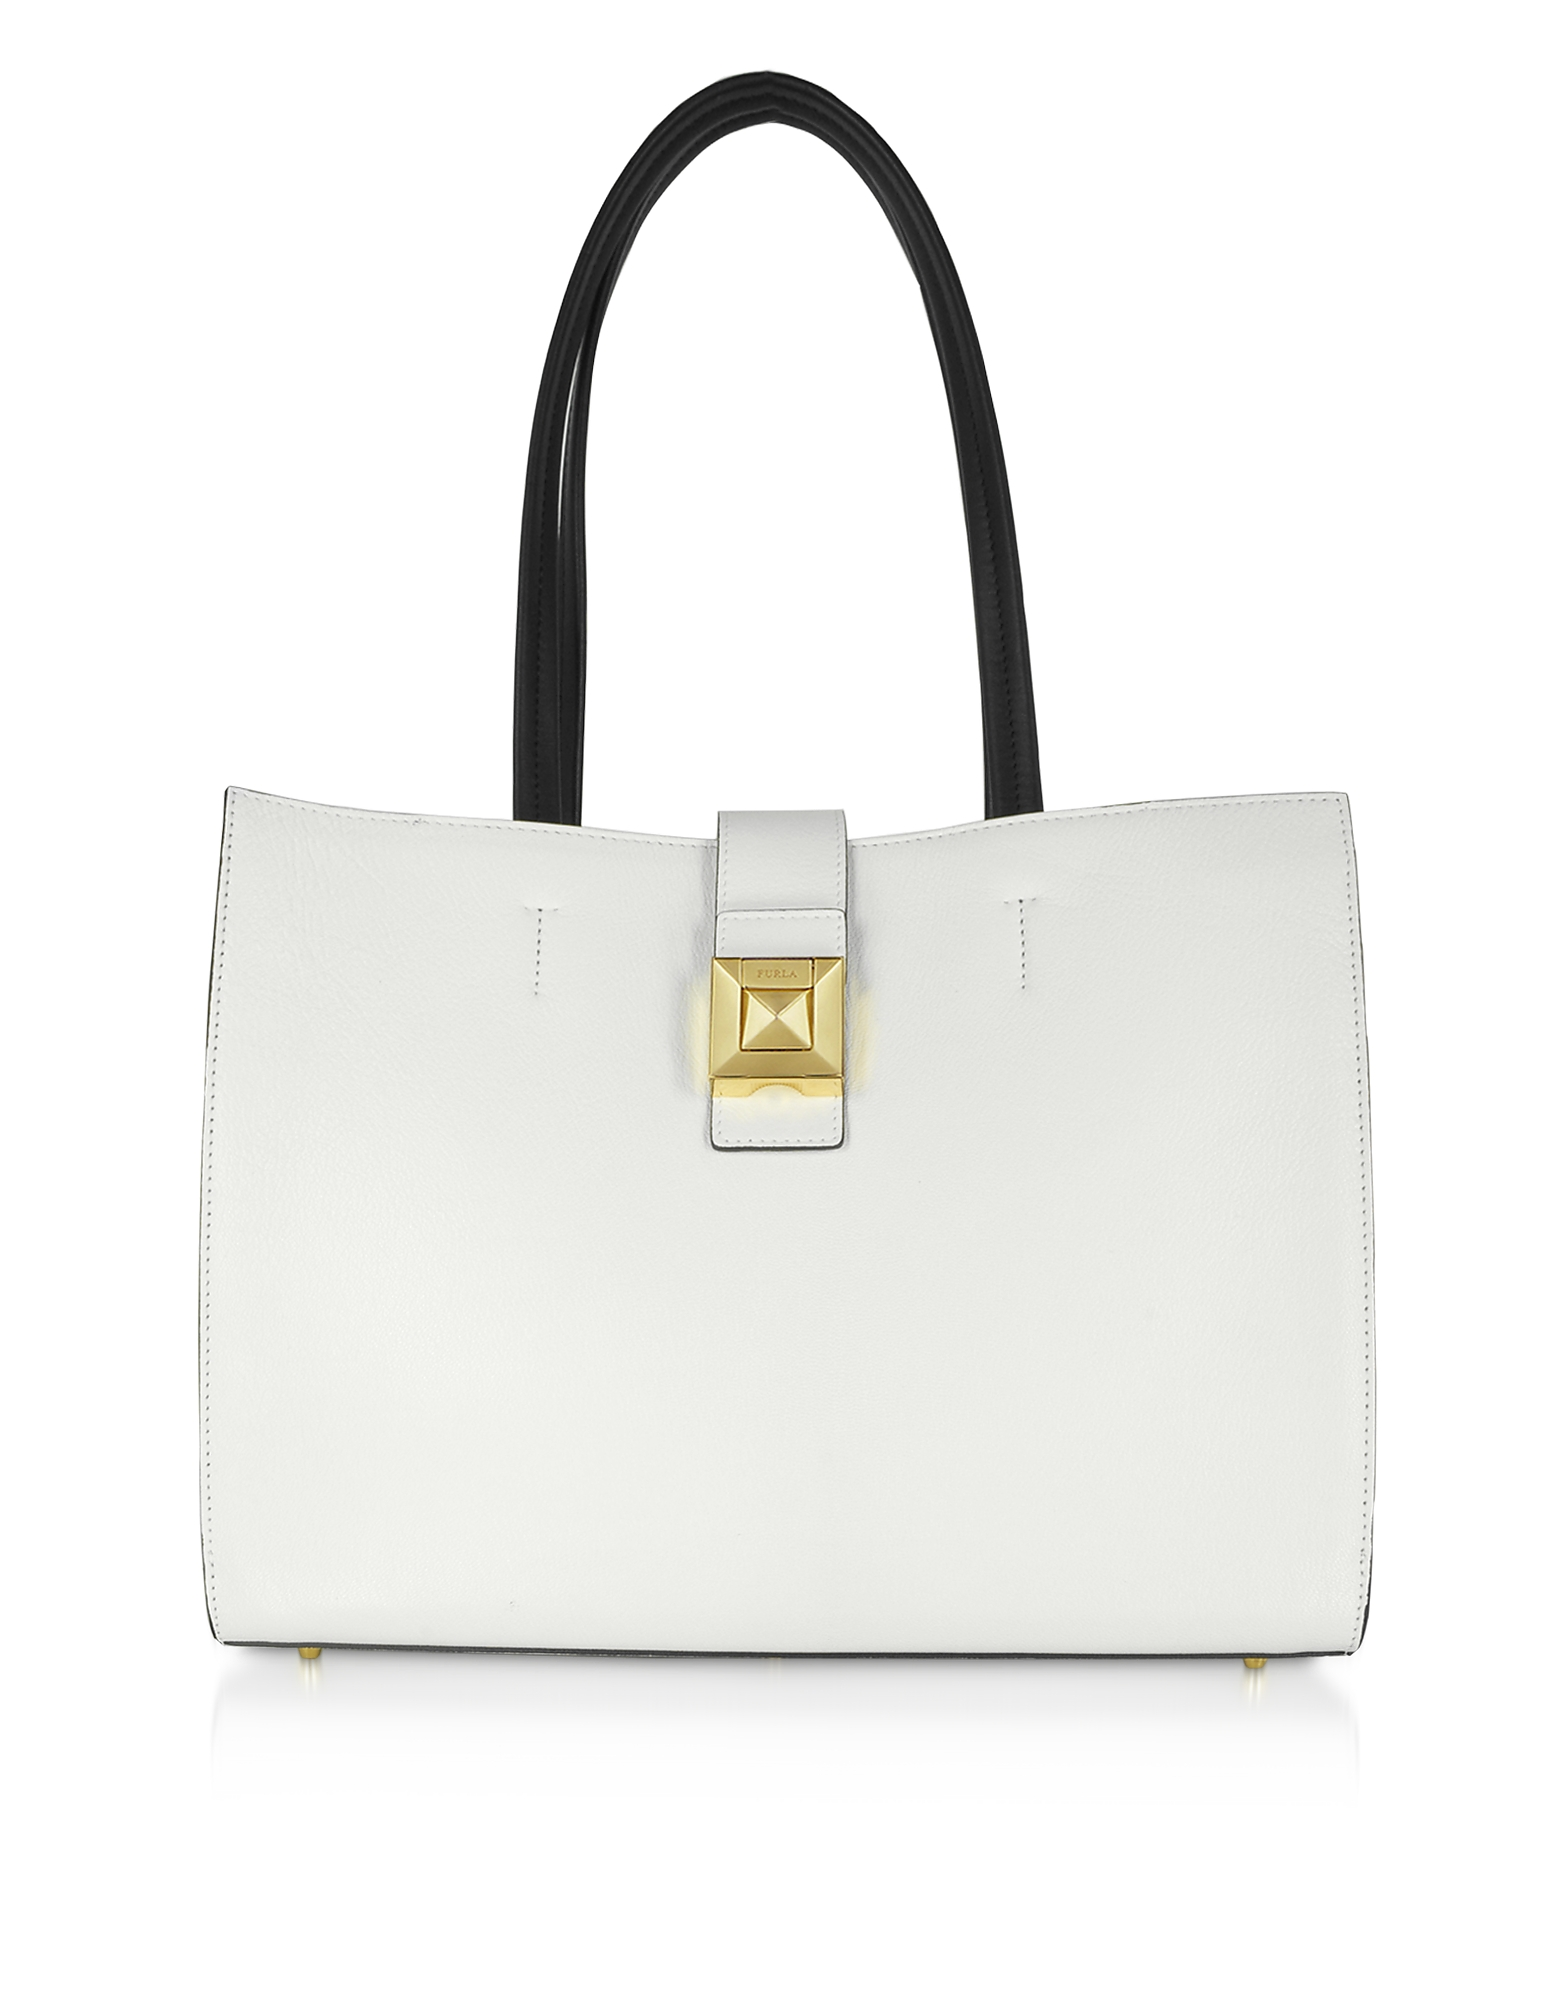 Furla Designer Handbags, Diva L Tote Bag